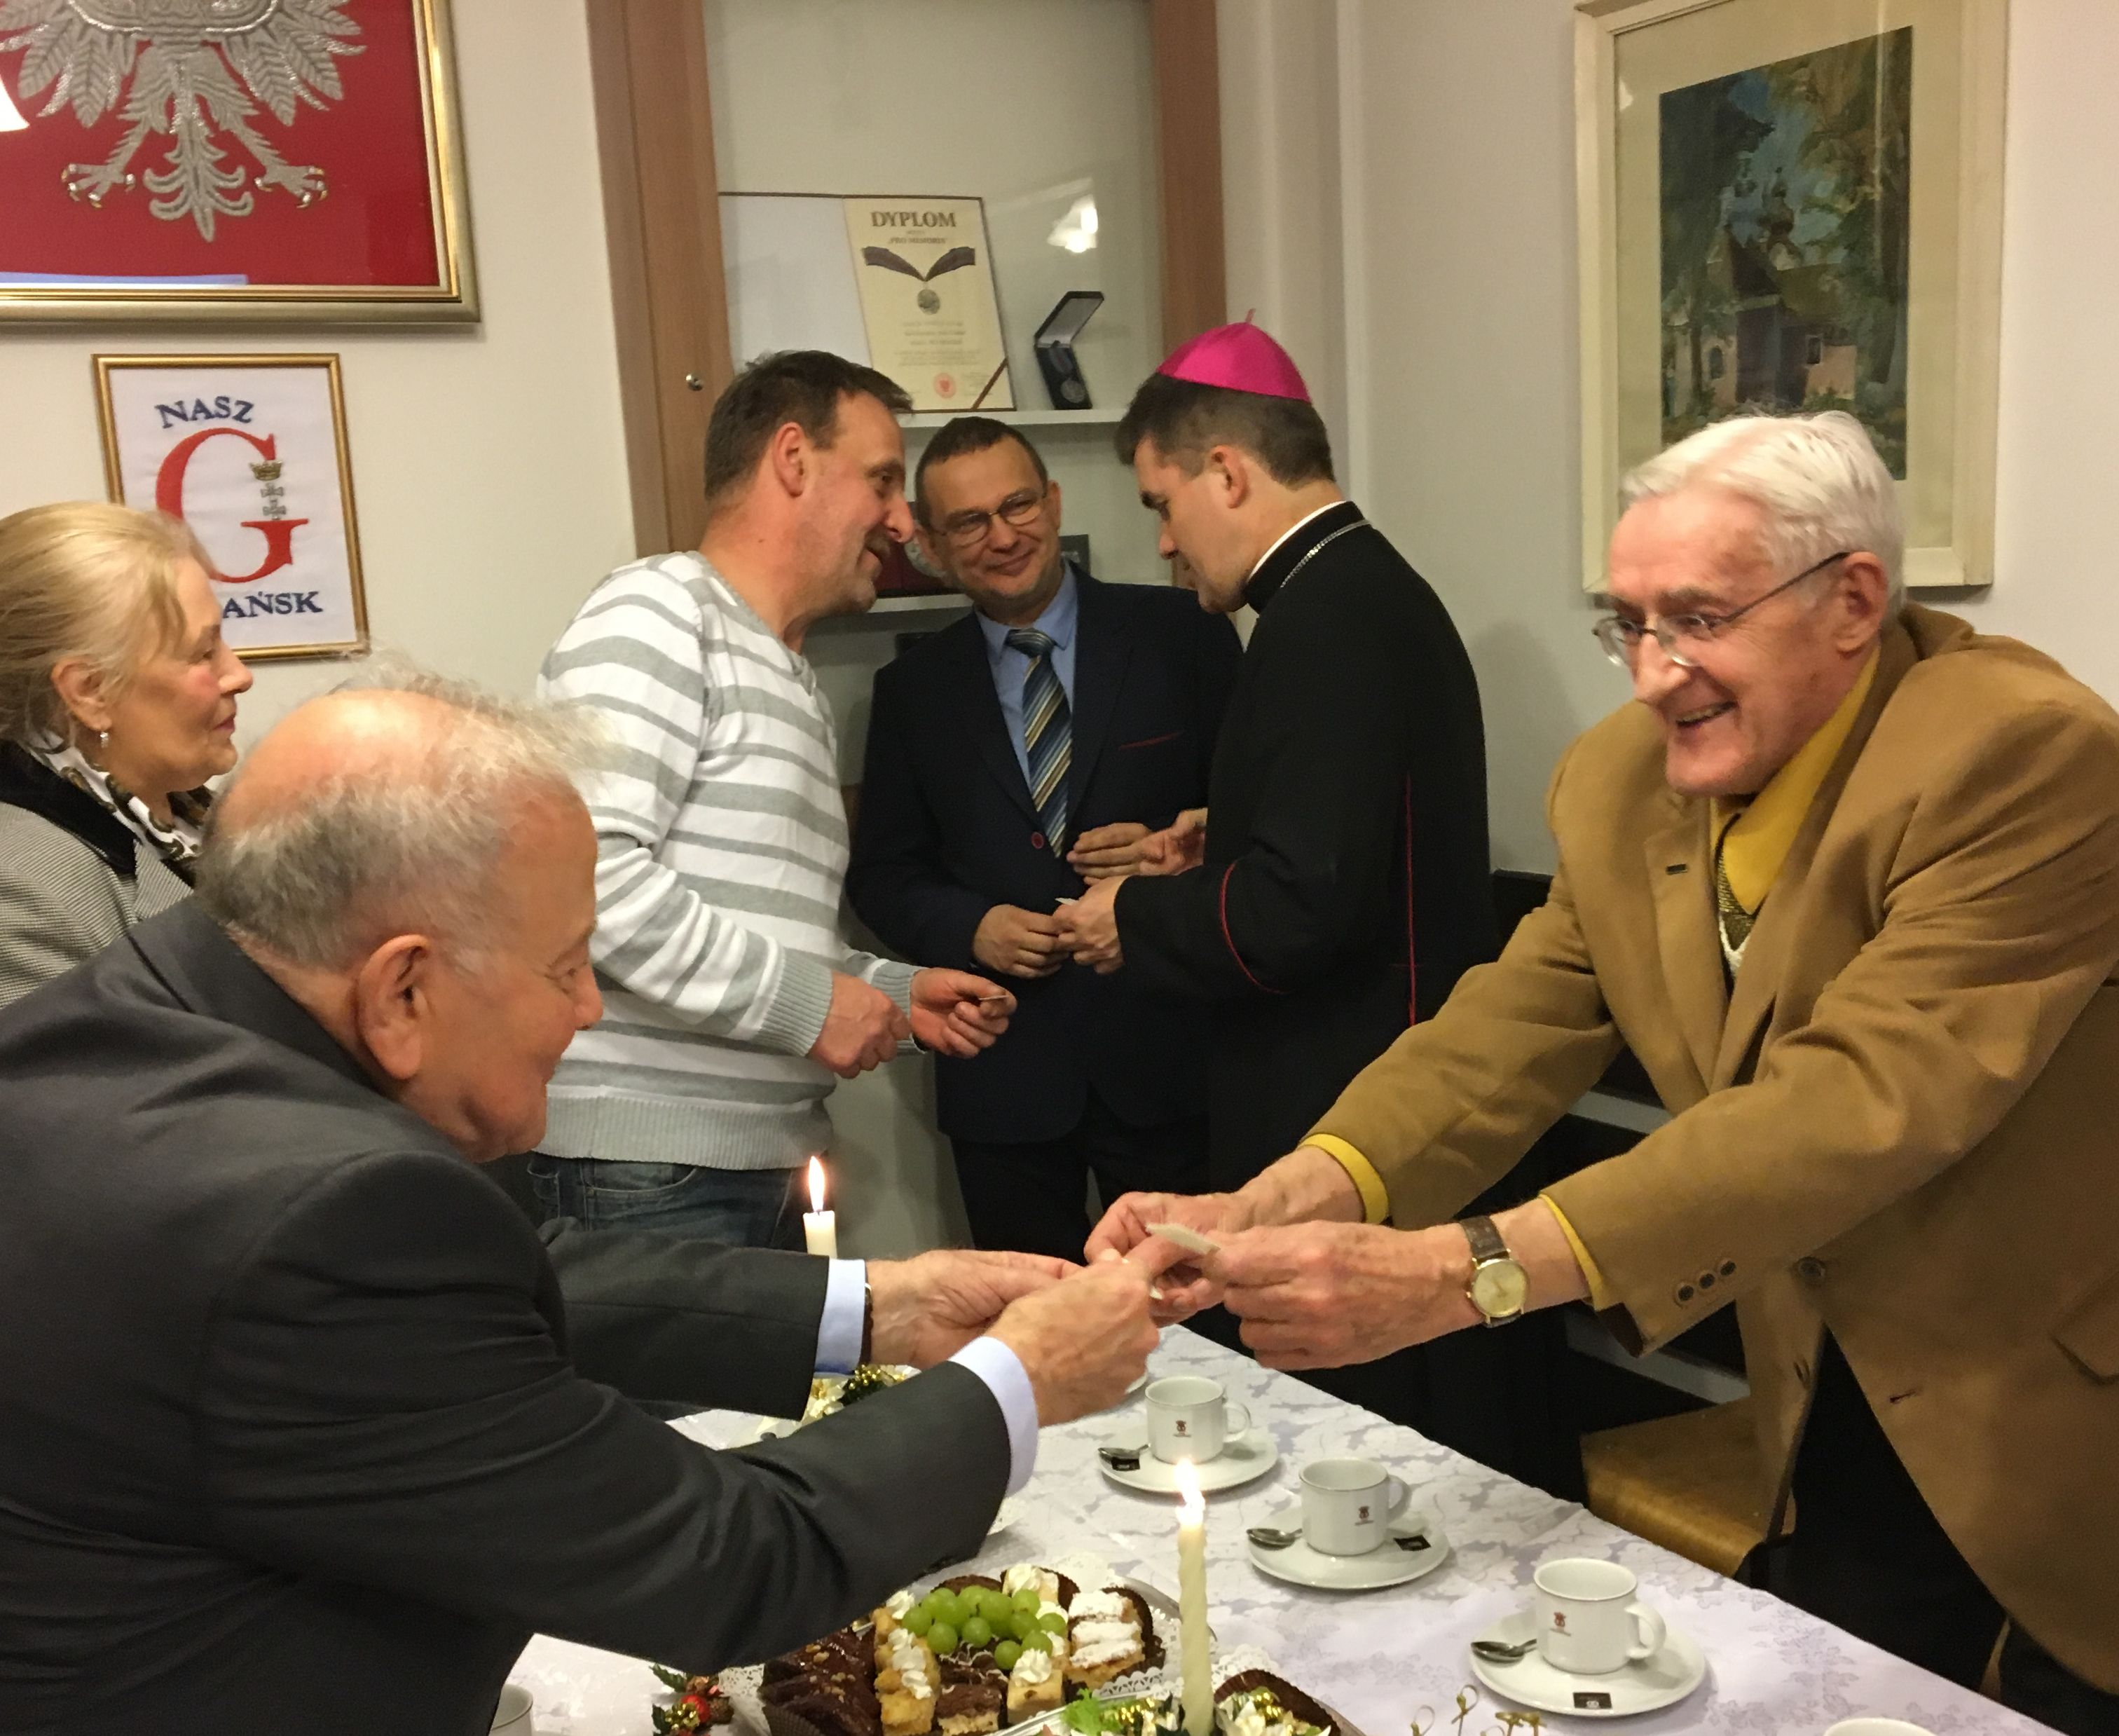 NG Opłatek z biskupem fot_J_Wikowski IMG_1695 kadr — kopia